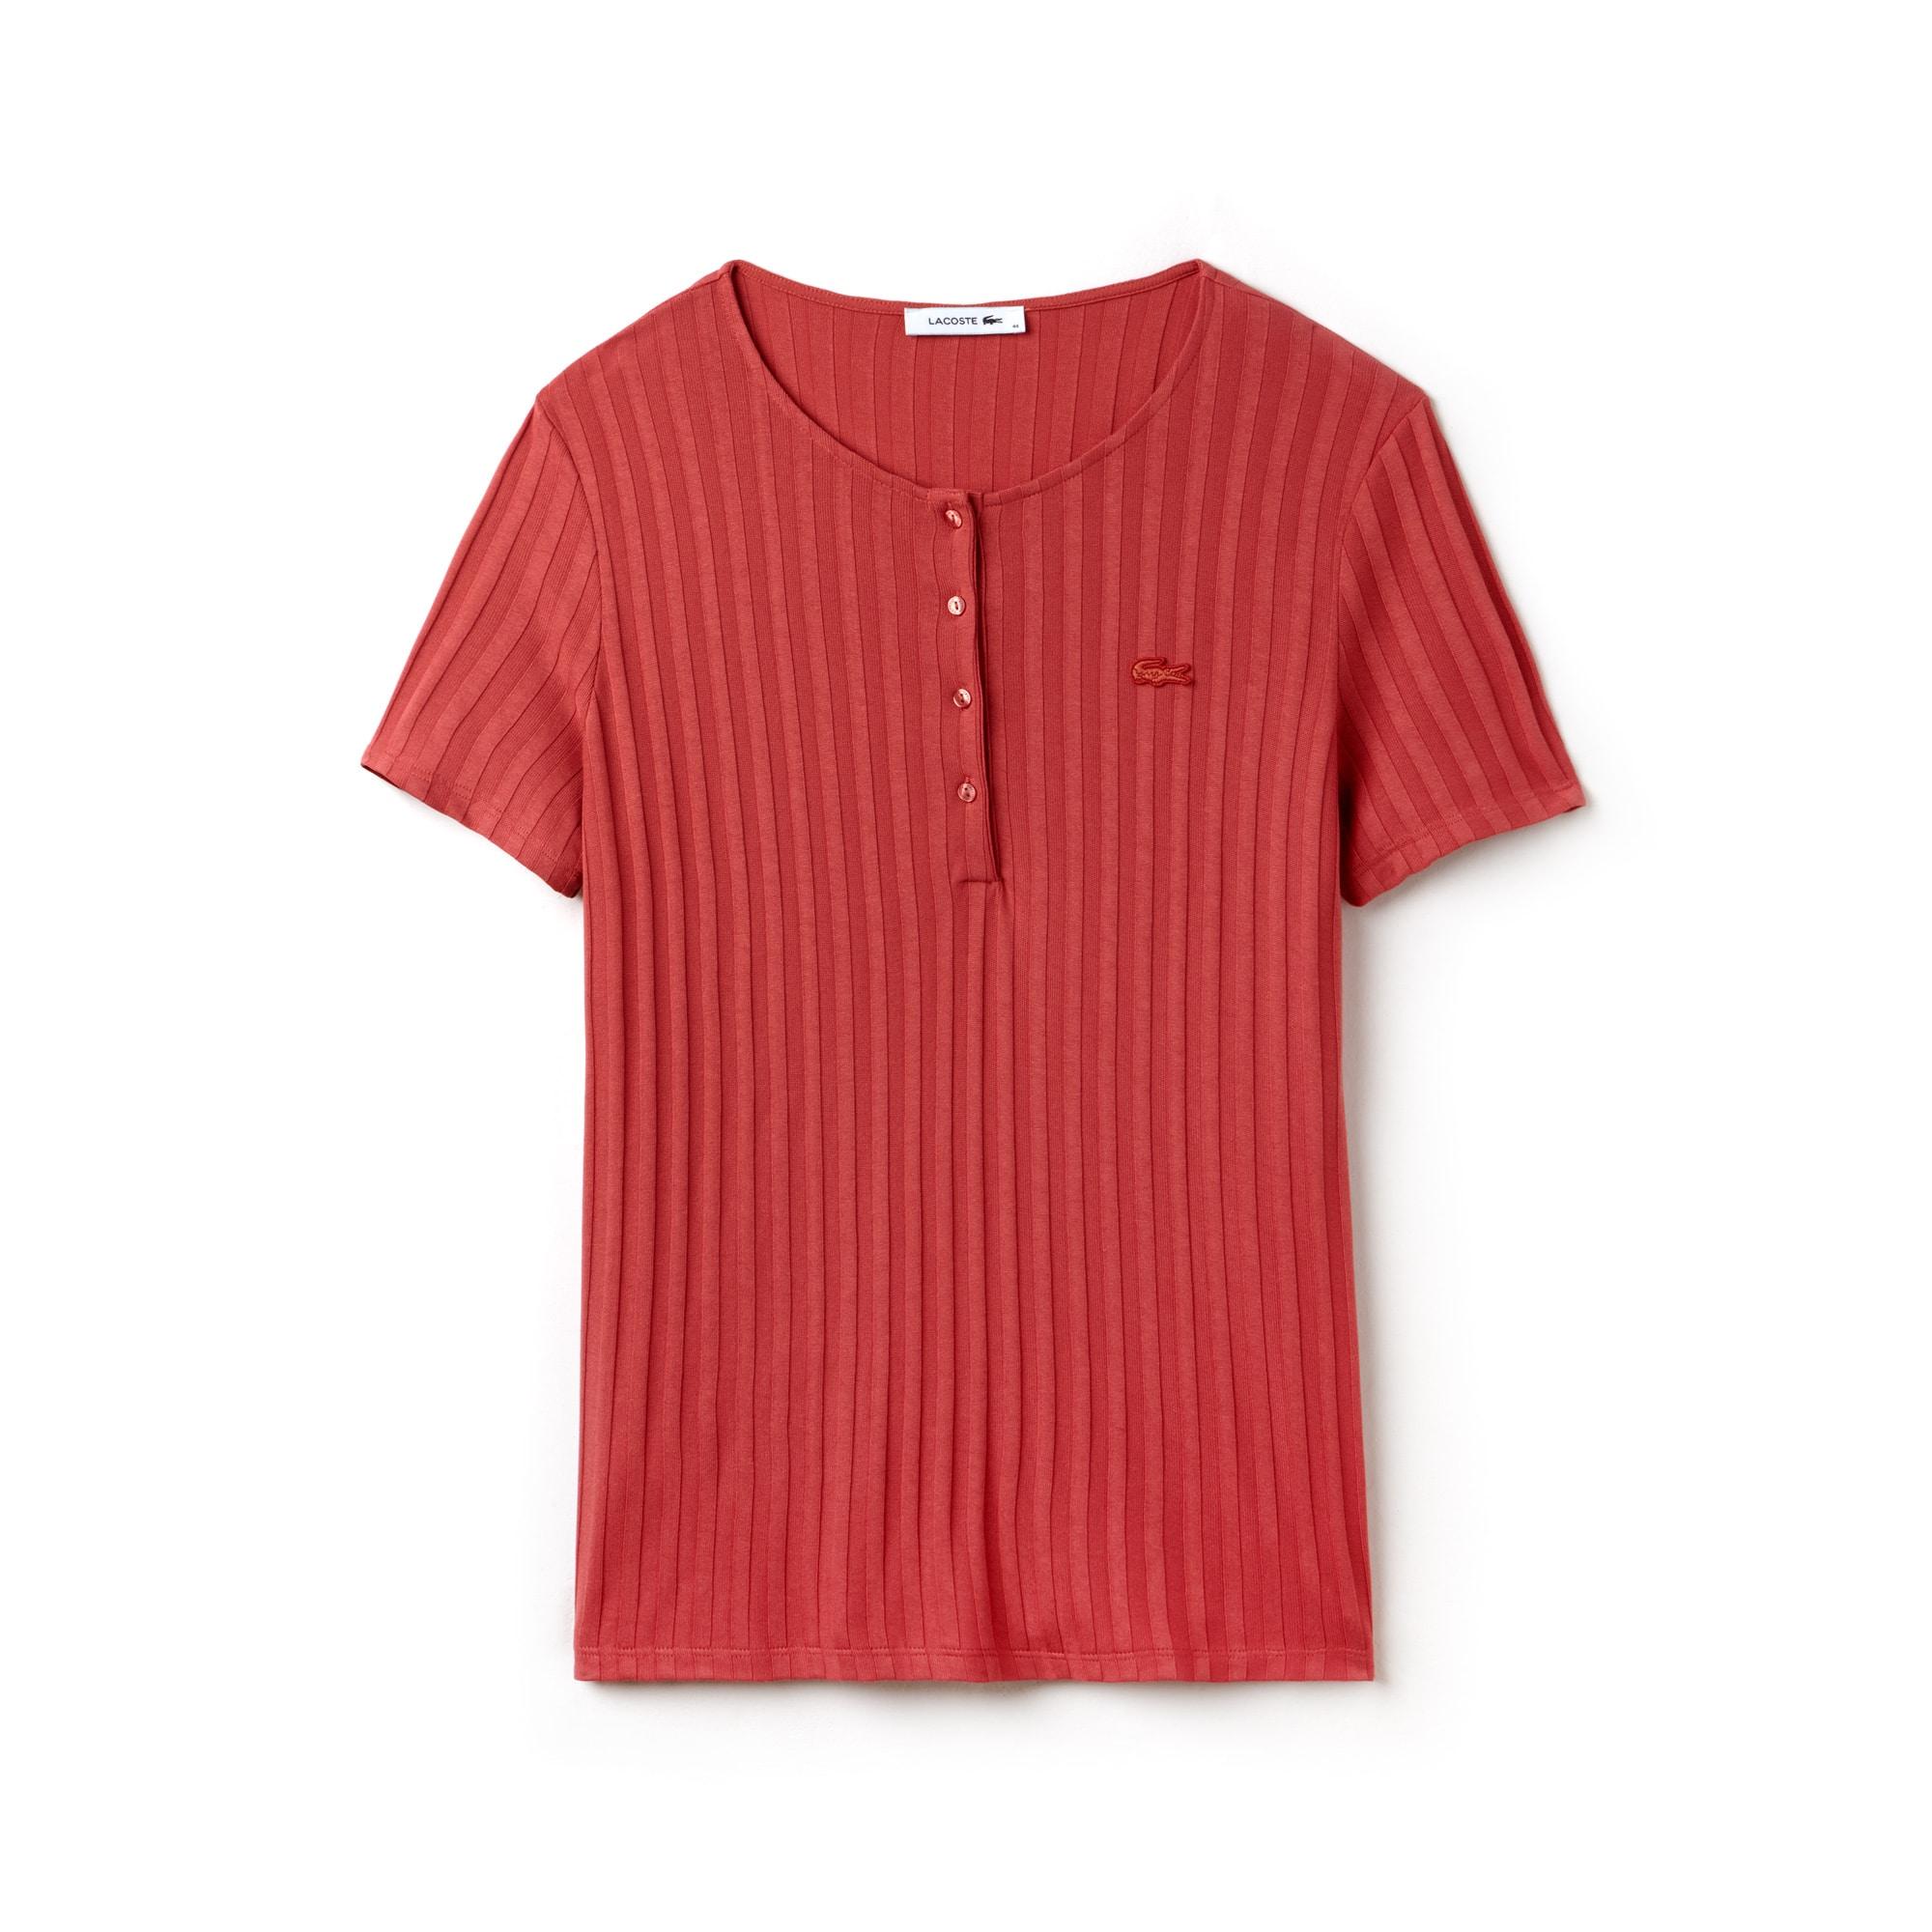 Women's Henley Neck Ribbed Knit T-shirt